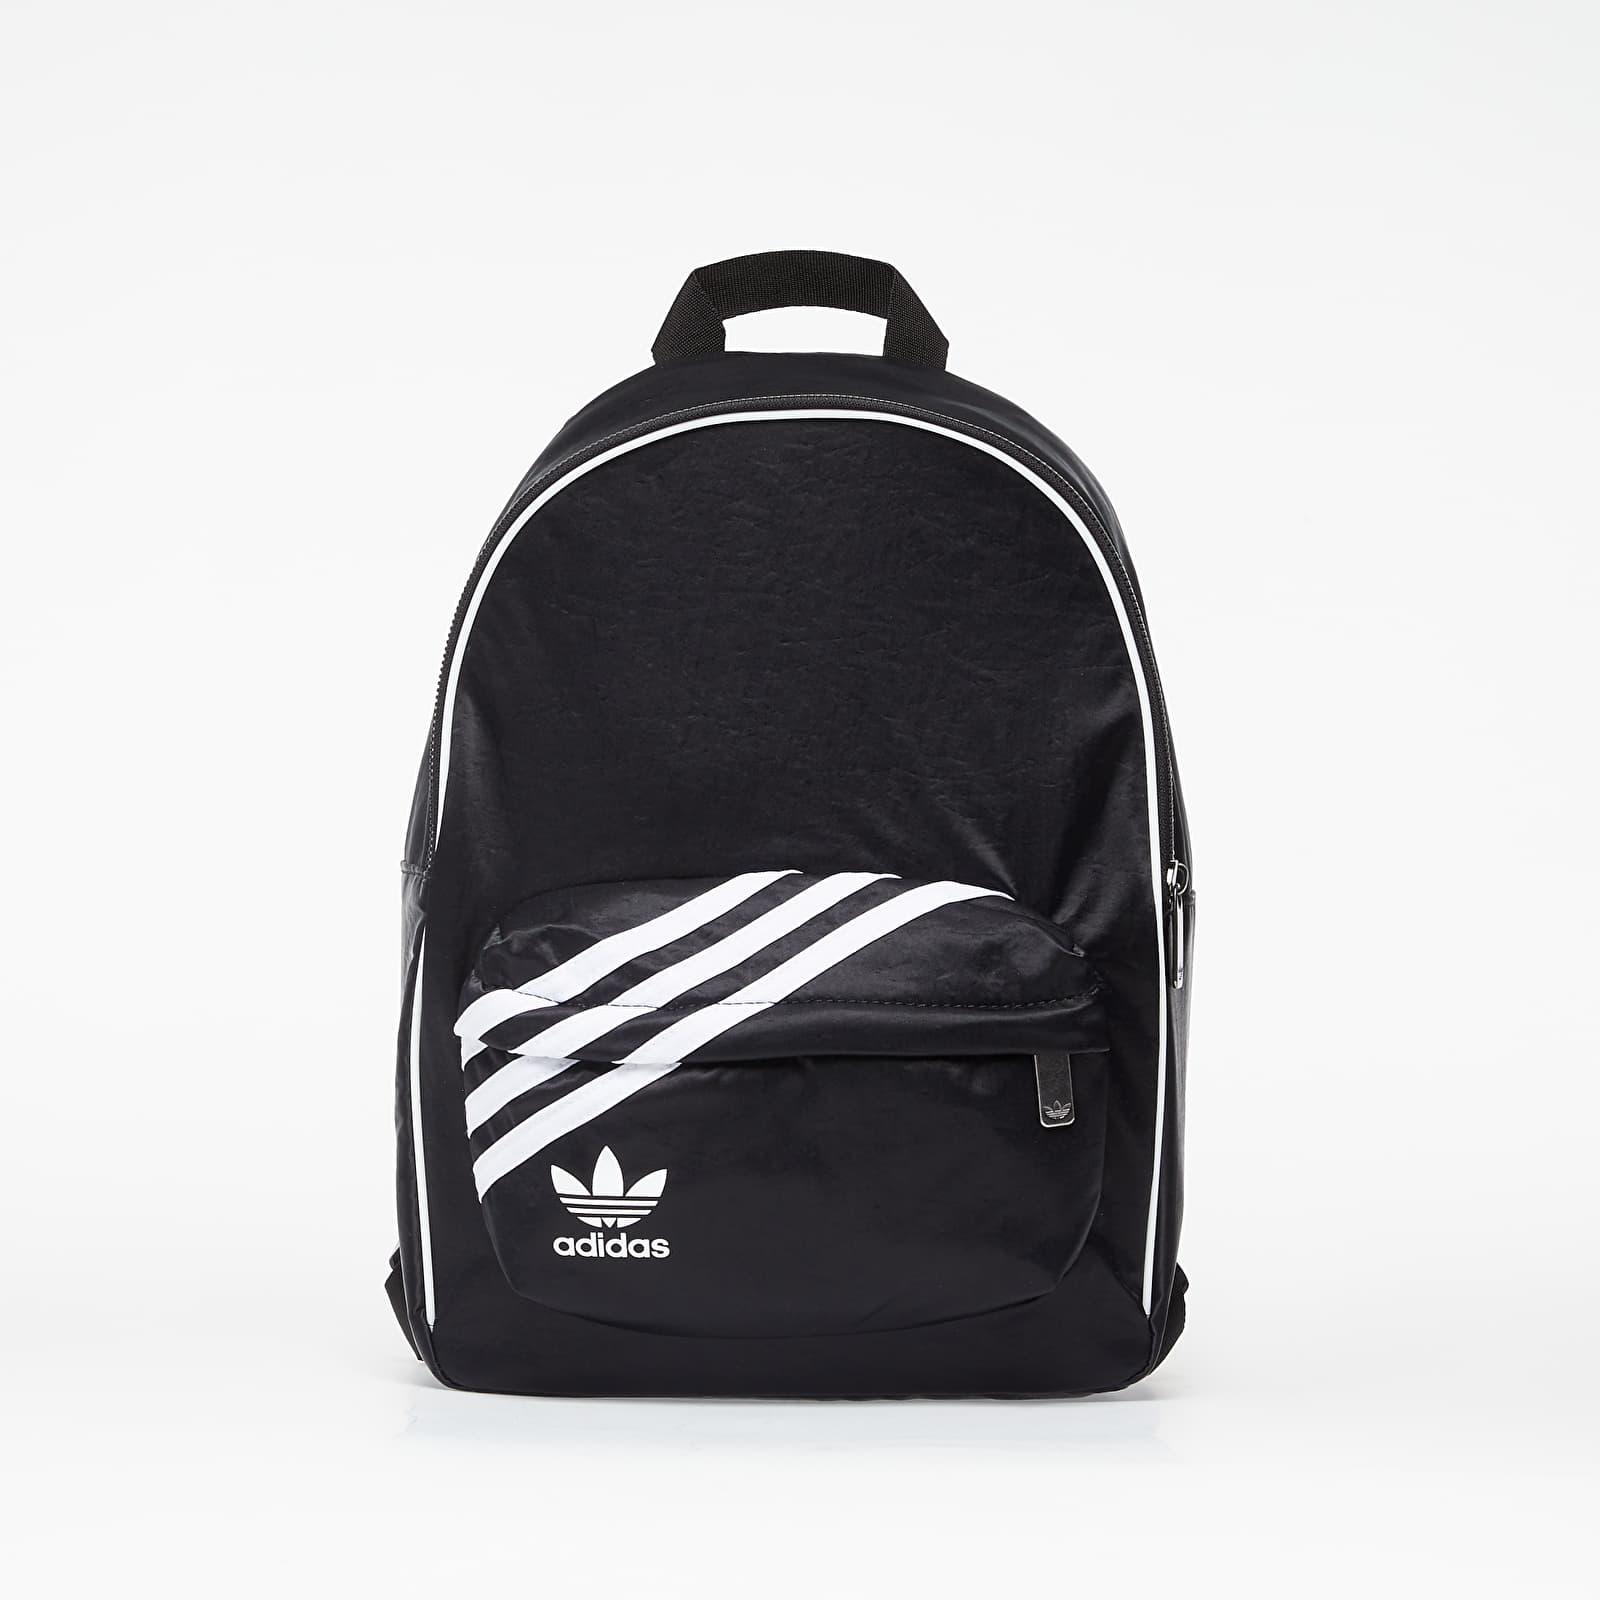 adidas Nylon W Backpack Black EUR